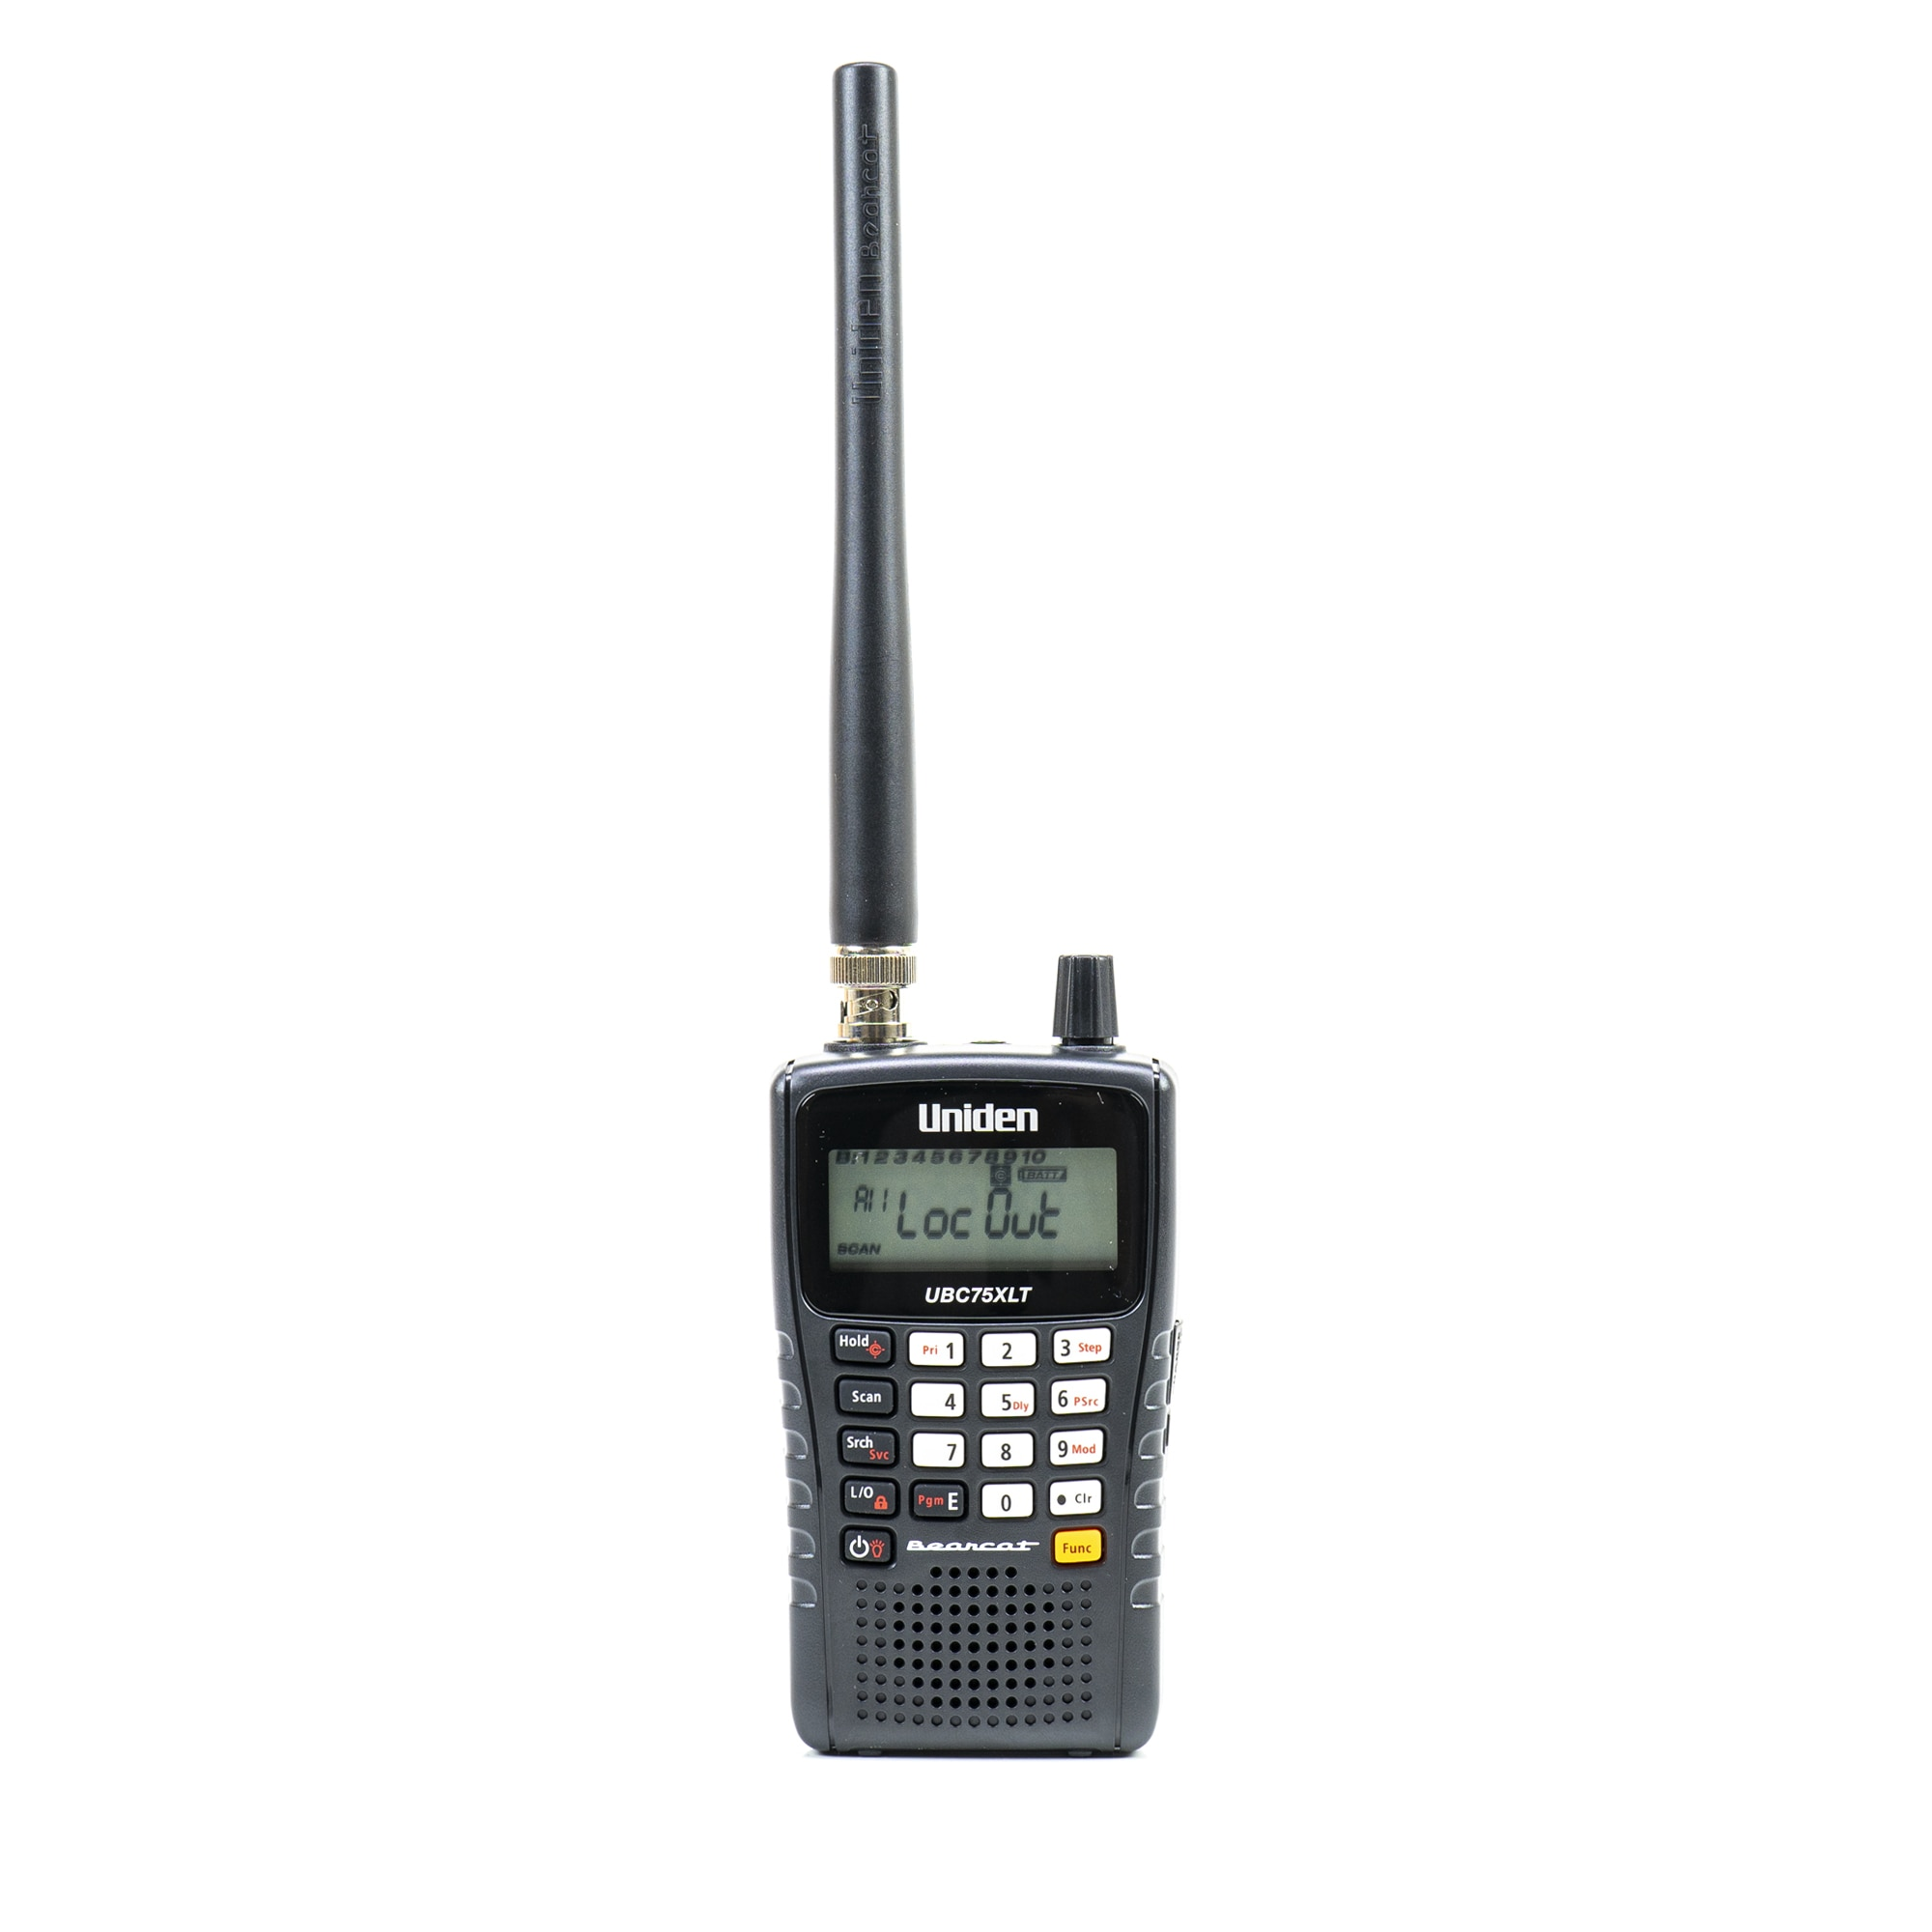 Fotografie Scaner portabil Uniden UBC75XLT, 300CH, 25-88 MHz, 108-174 MHz, 400-512MHz cu antena si acumulatori 2 x 2300mAh inclus